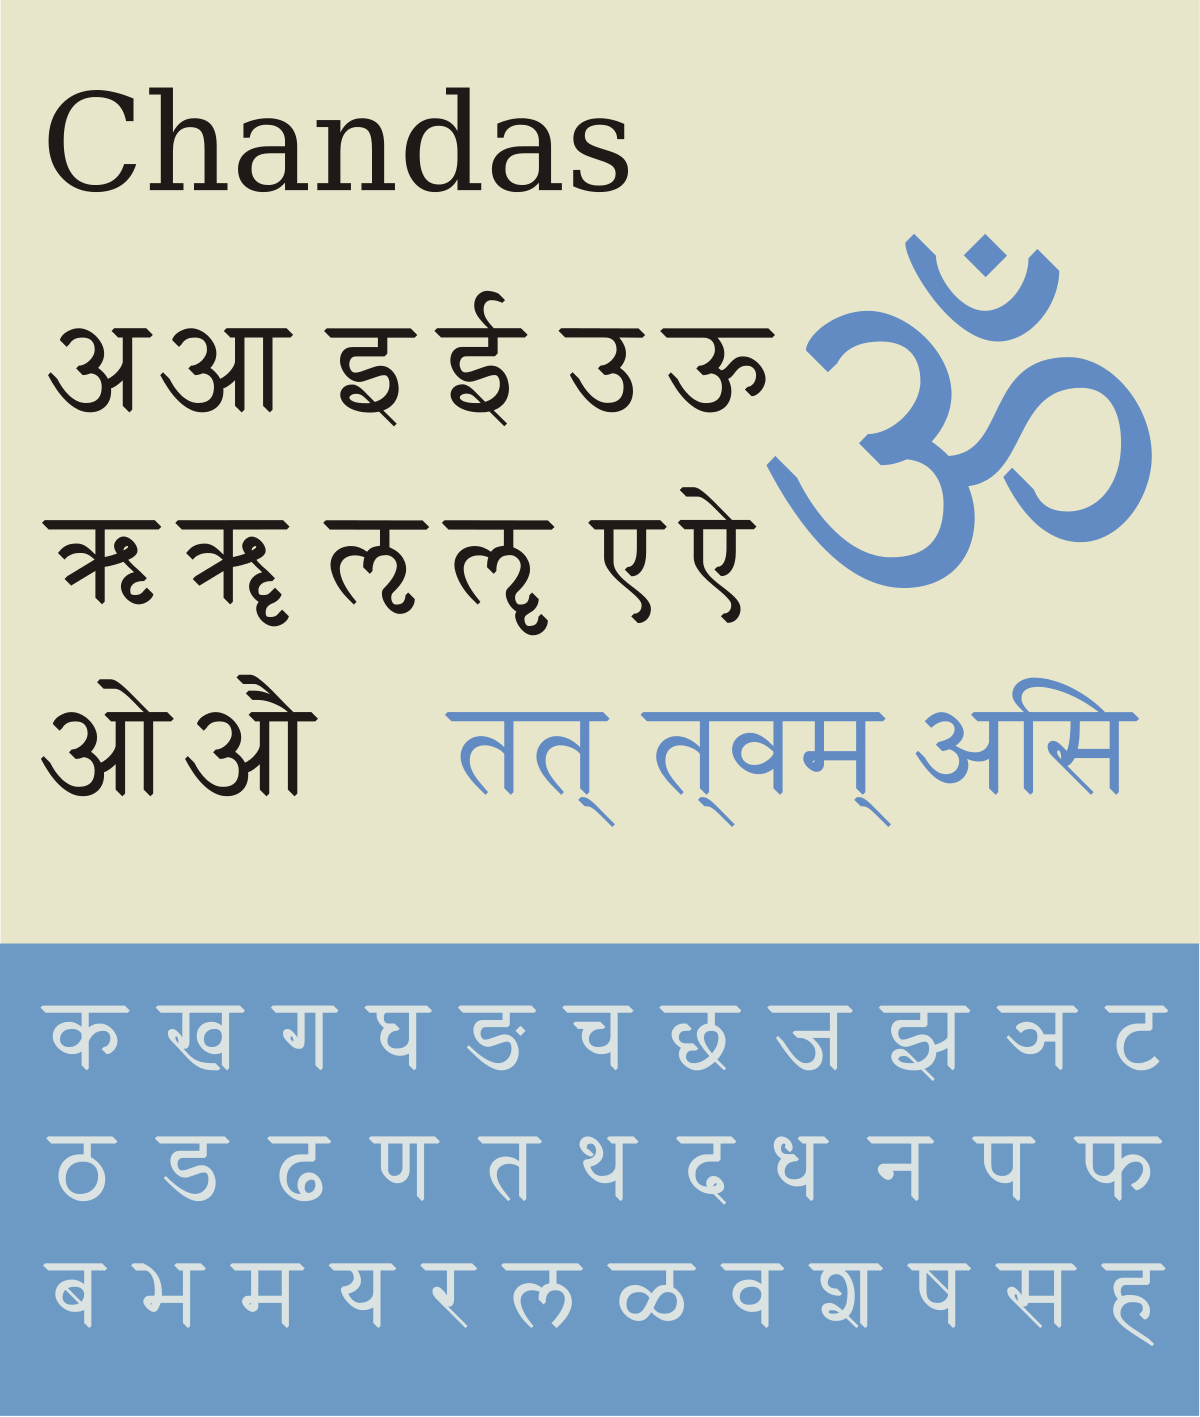 Devanagari Wikipedia La Enciclopedia Libre Writing Systems Typeface Font Anatomy [ 1417 x 1200 Pixel ]